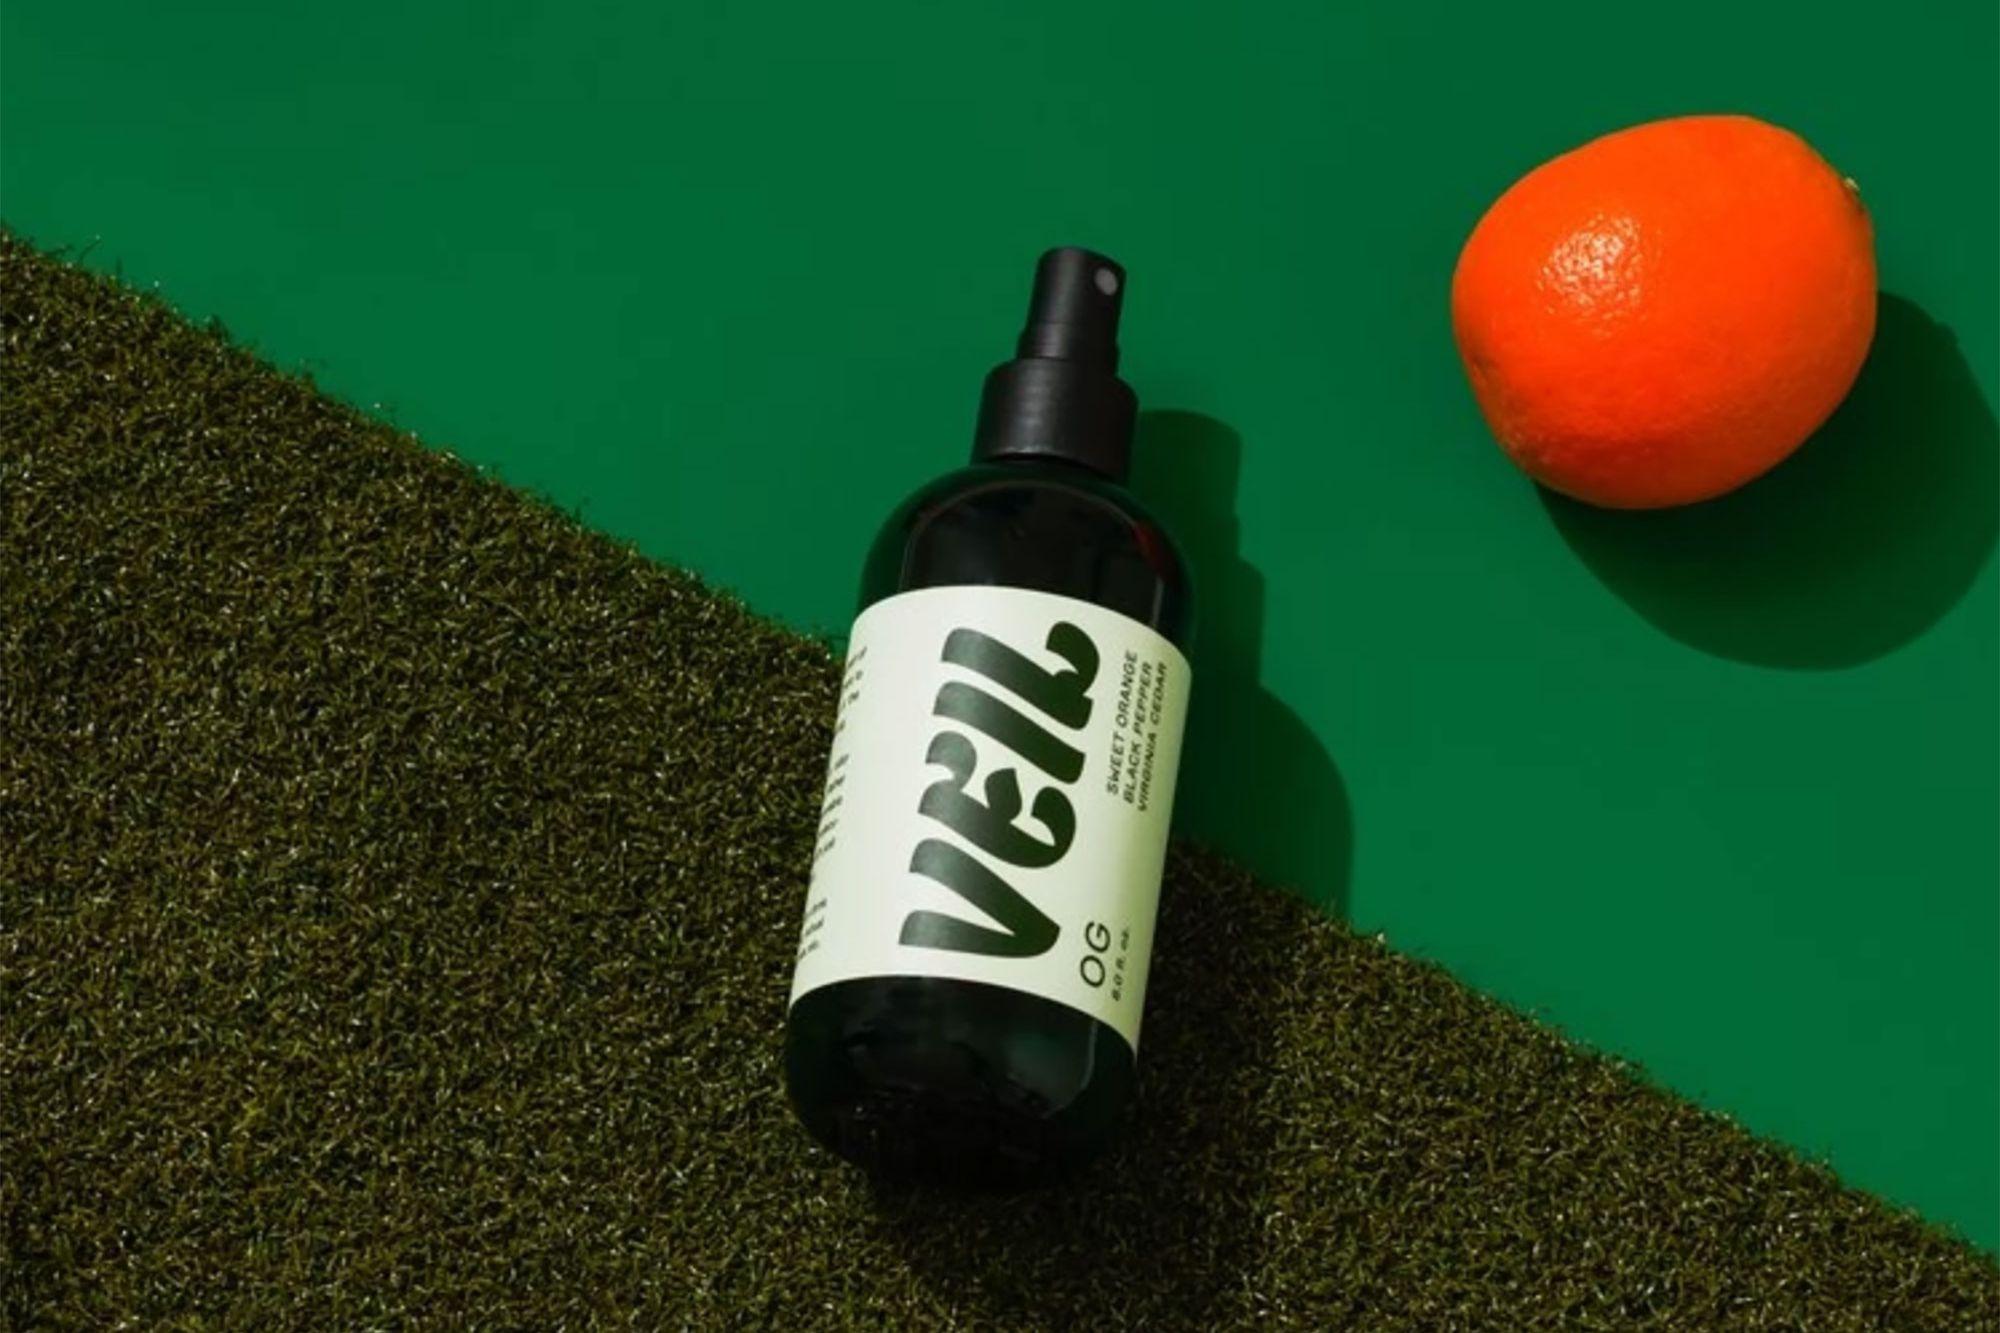 How a new spray called Veil is masking marijuana's smoky scent